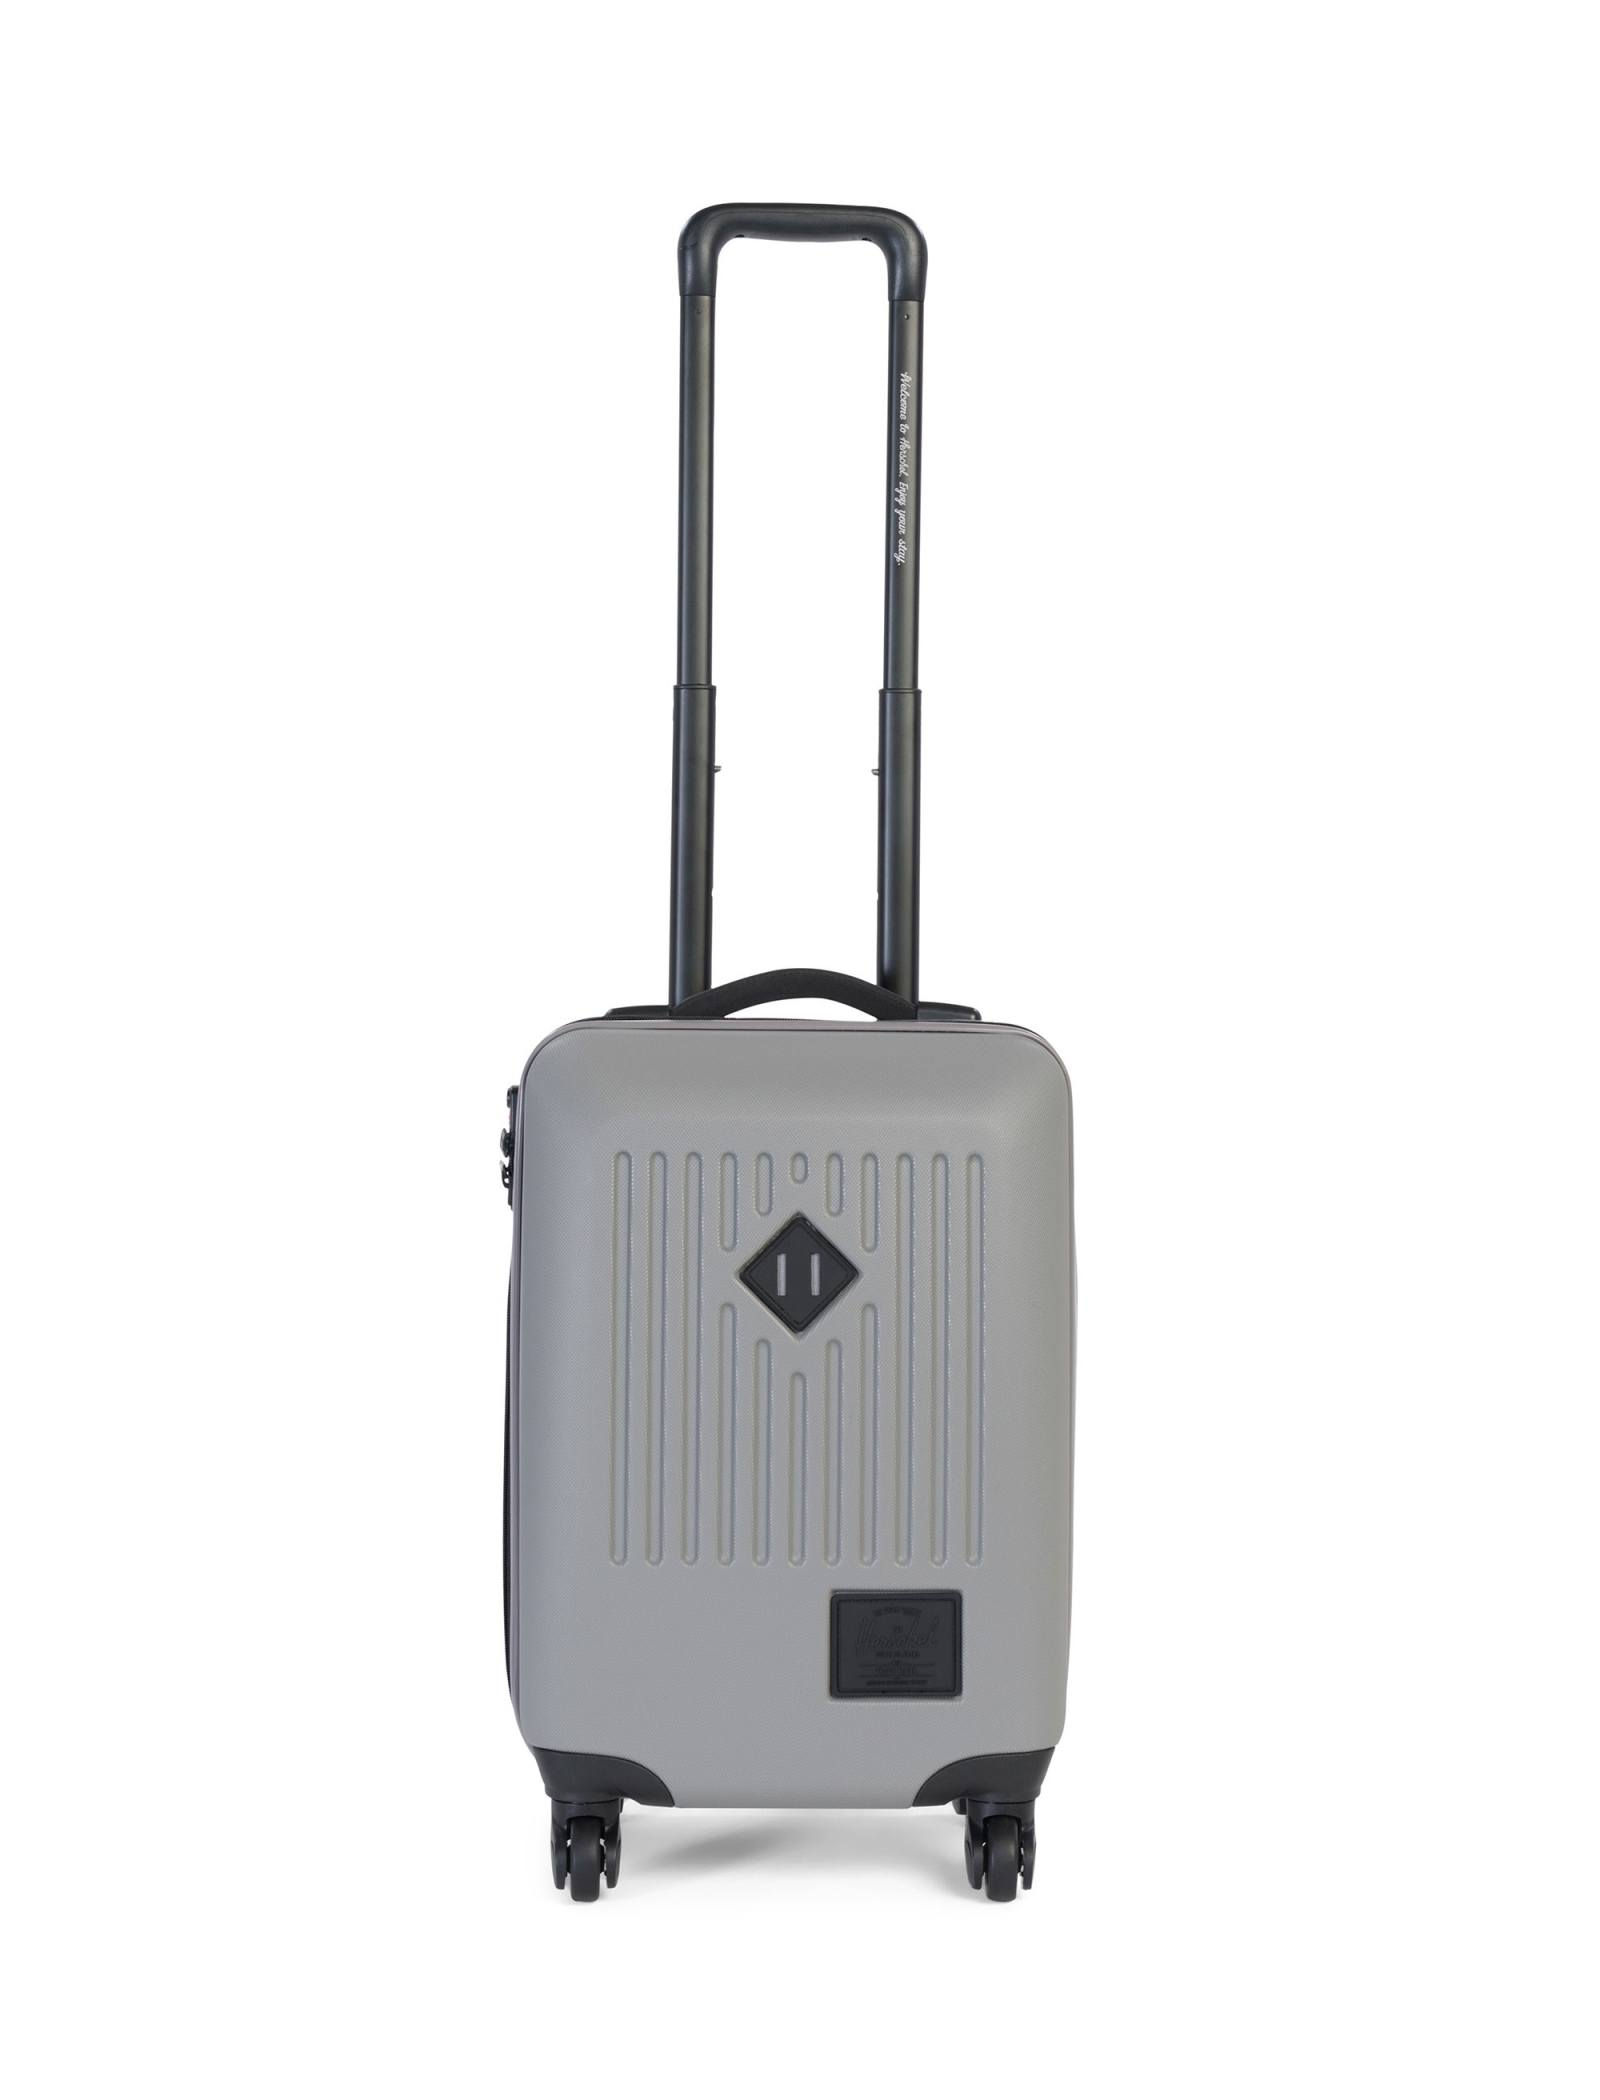 چمدان Trade Small - هرشل - طوسي - 2